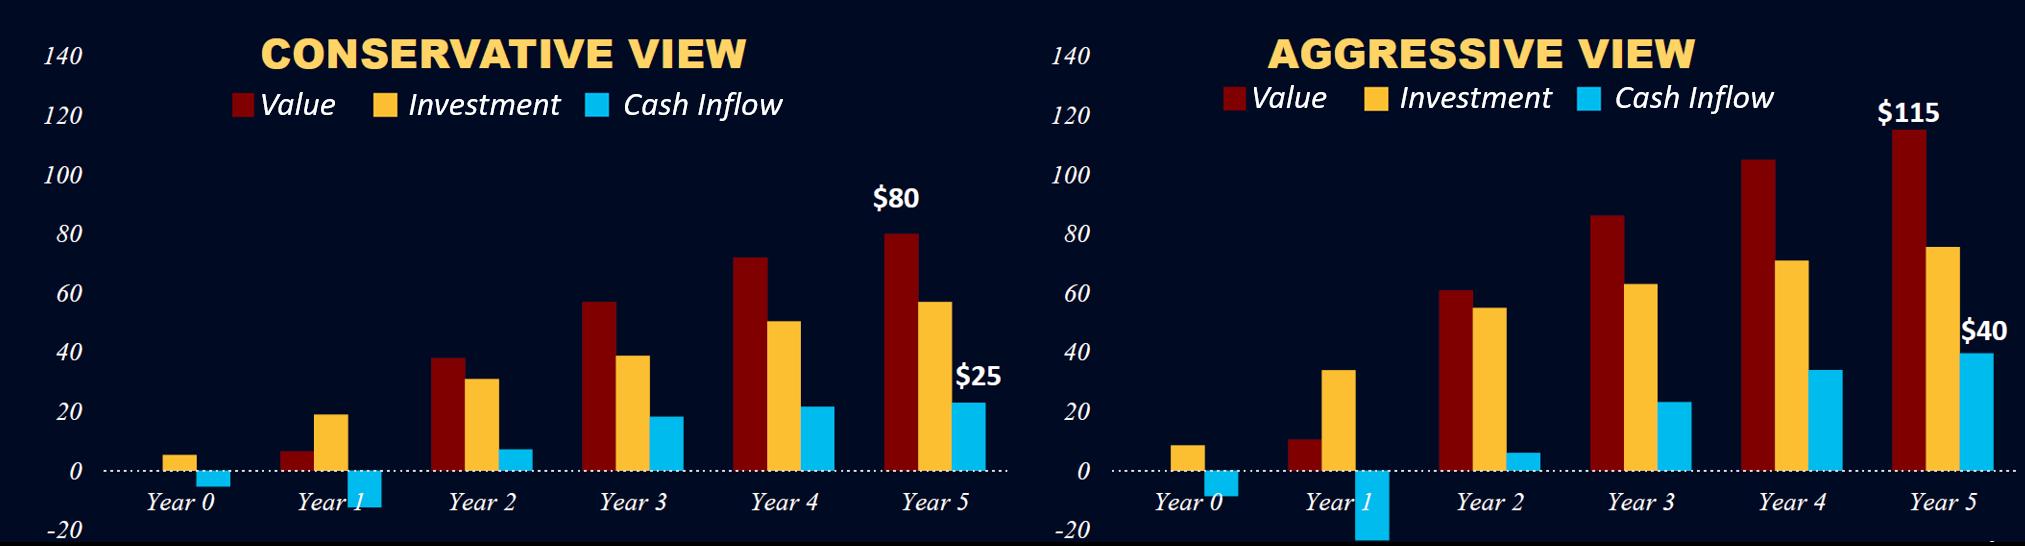 conservative-vs-aggressive-cashflow-projection